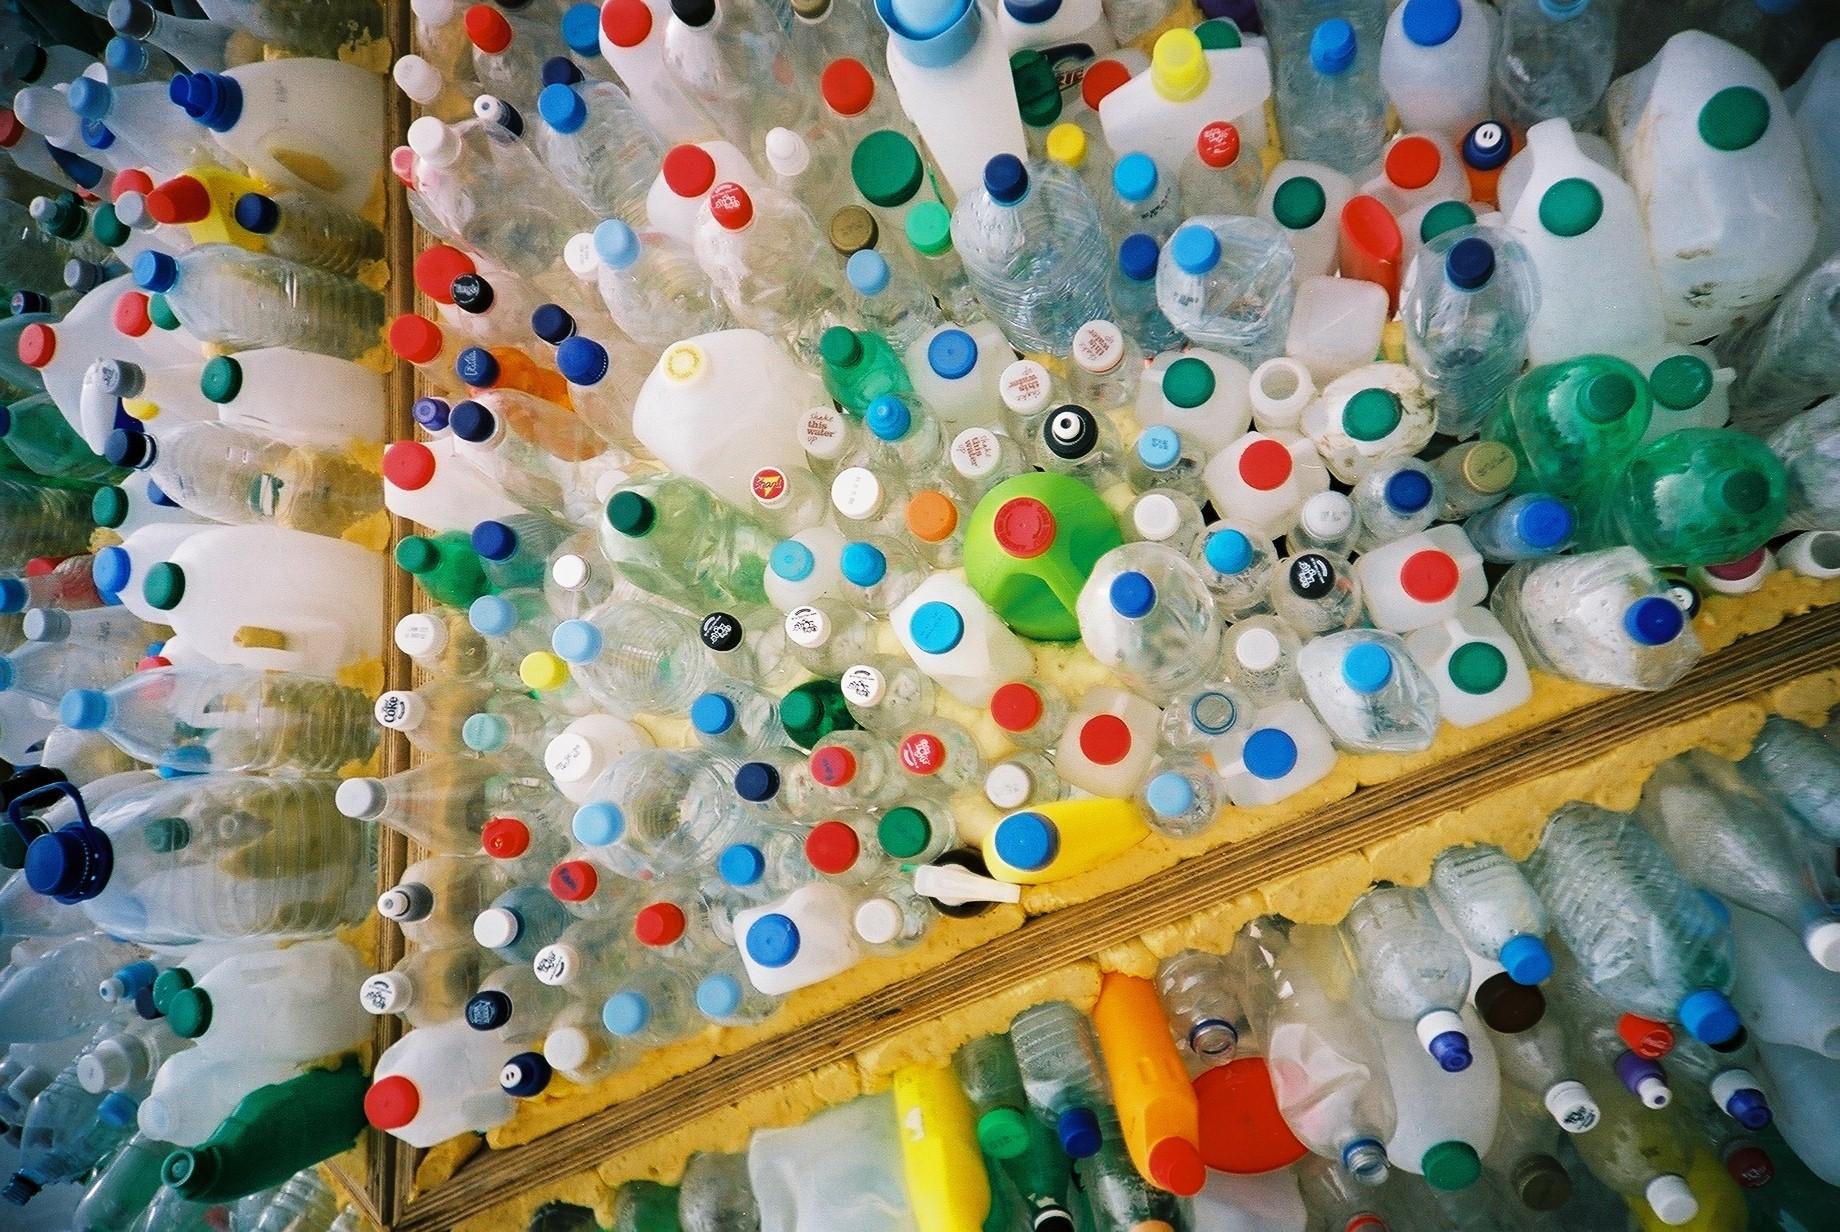 "<p>Фото: &copy;&nbsp;<a href=""https://www.flickr.com/photos/rob-sinclair/2626478892/"" target=""_blank"">flickr.com/Rob Sinclair</a></p>"